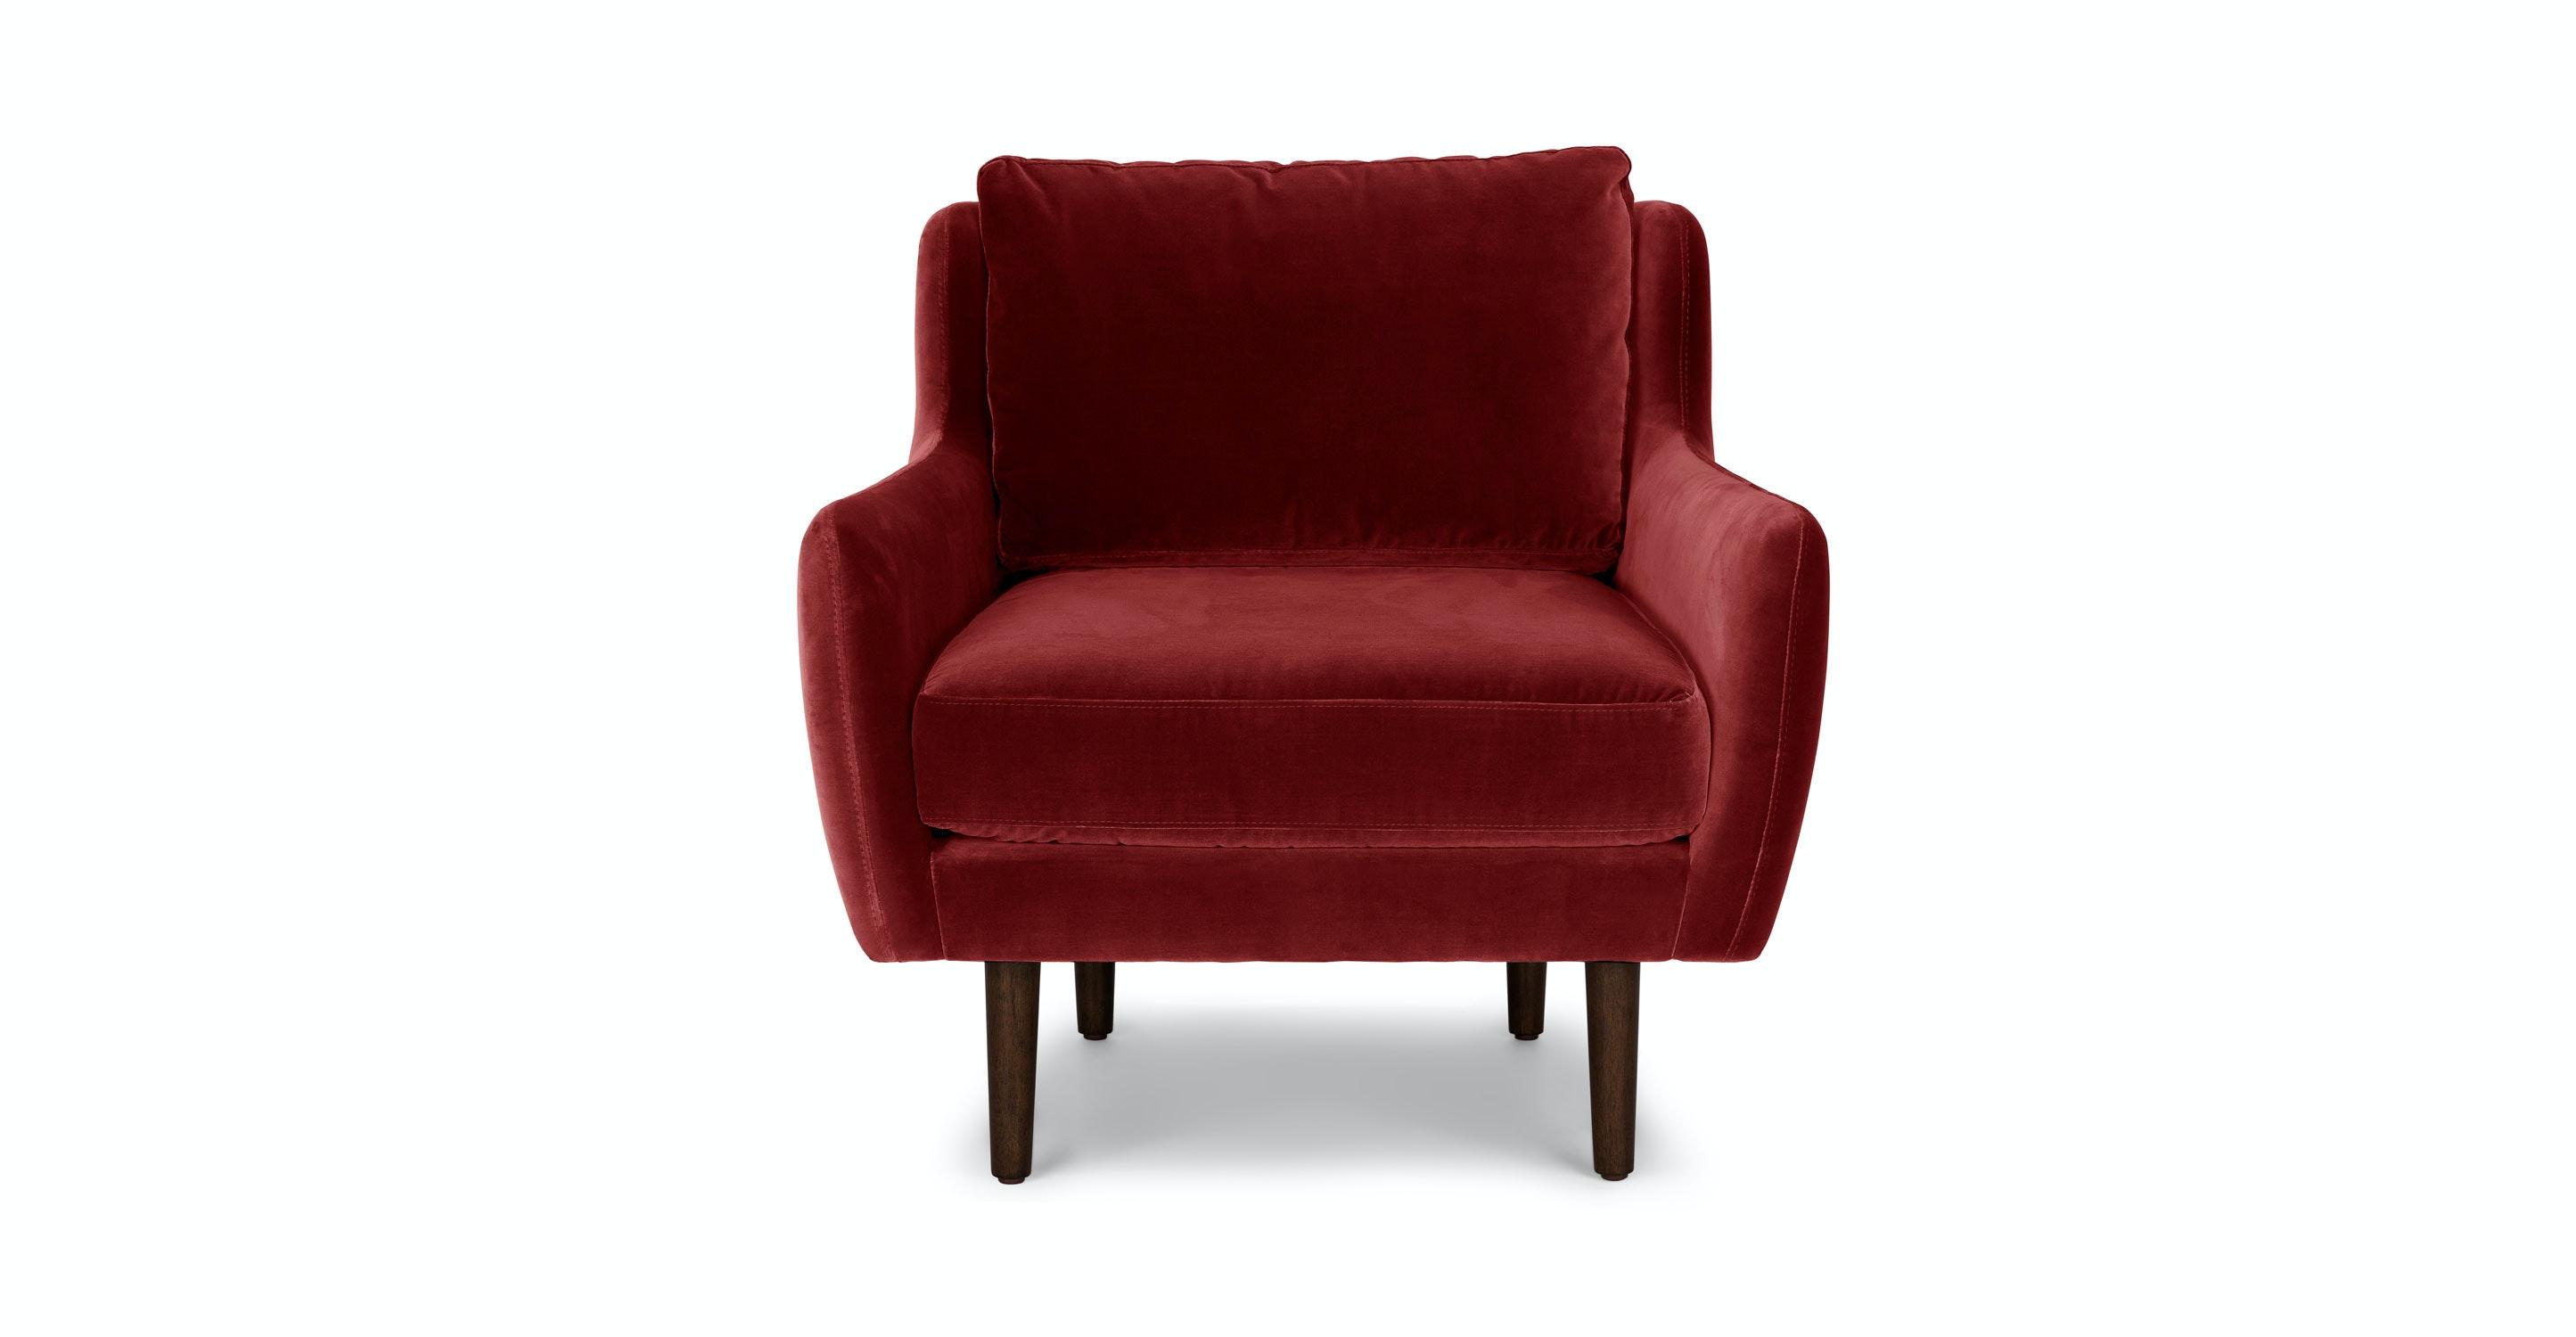 Matrix Cascadia Blue Chair   Lounge Chairs   Article | Modern, Mid Century  And Scandinavian Furniture